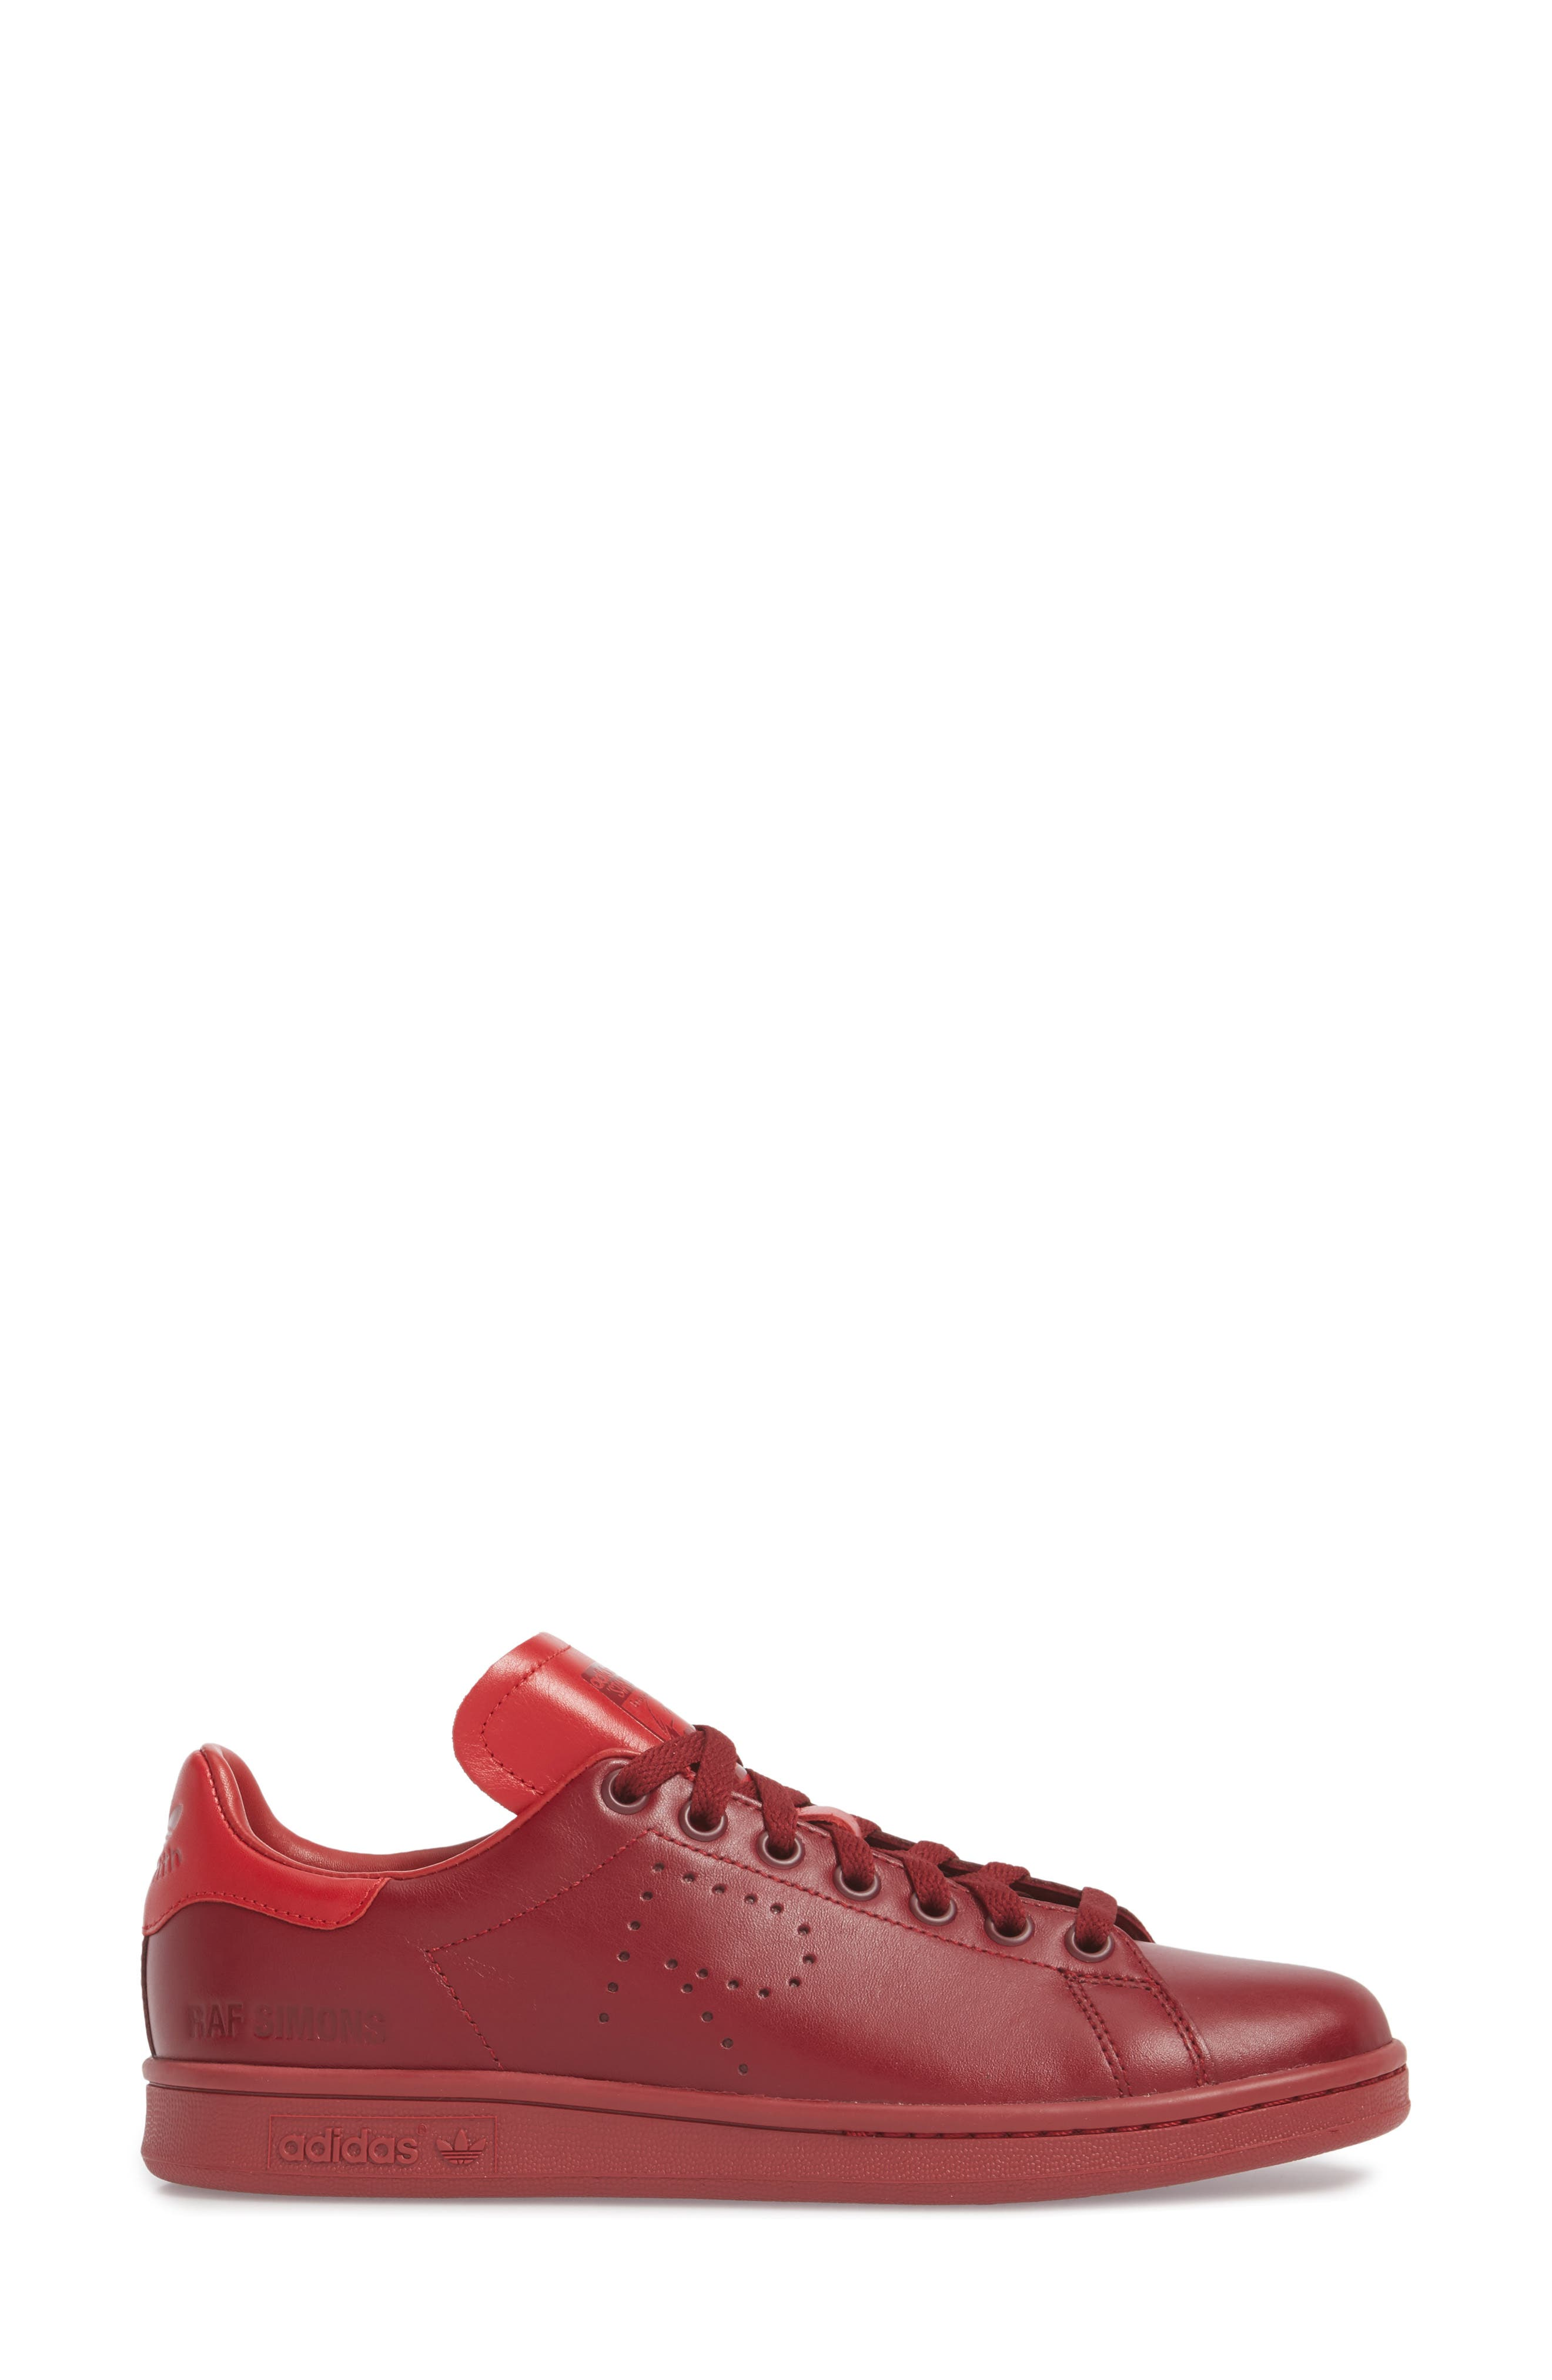 Stan Smith Sneaker,                             Alternate thumbnail 3, color,                             Burgundy/ Power Red/ Burgundy